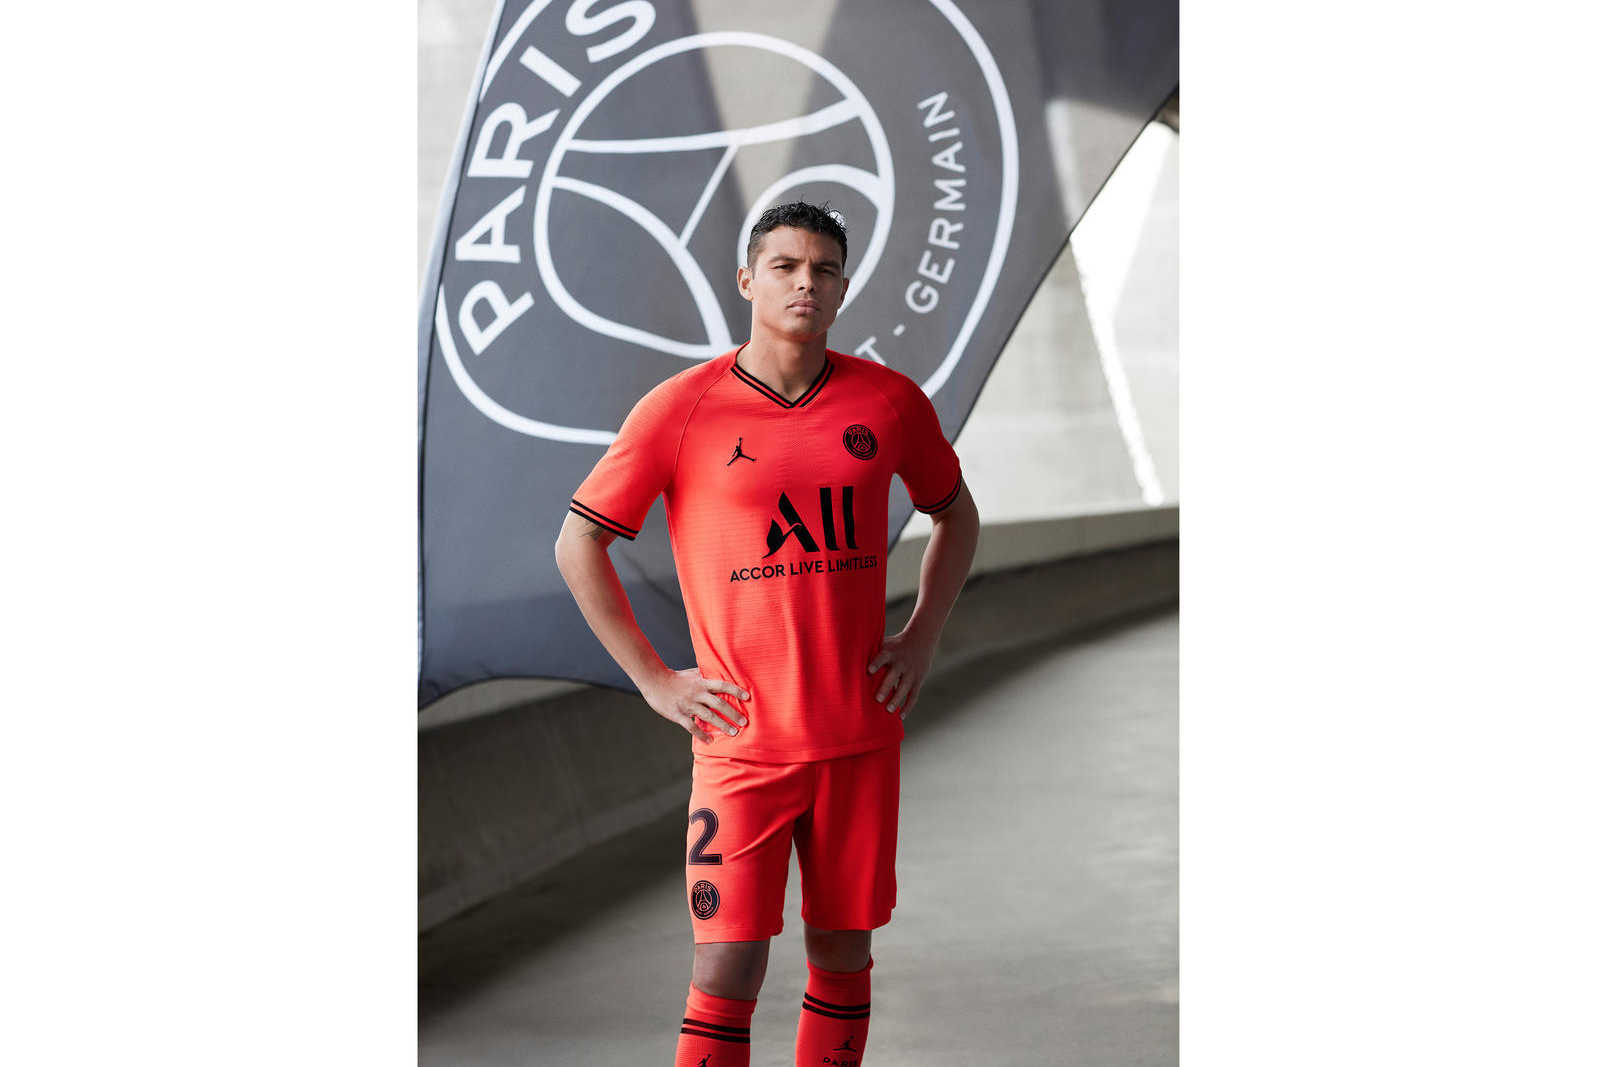 jordan-brand-paris-saint-germain-away-kit-2019-20-2_89276